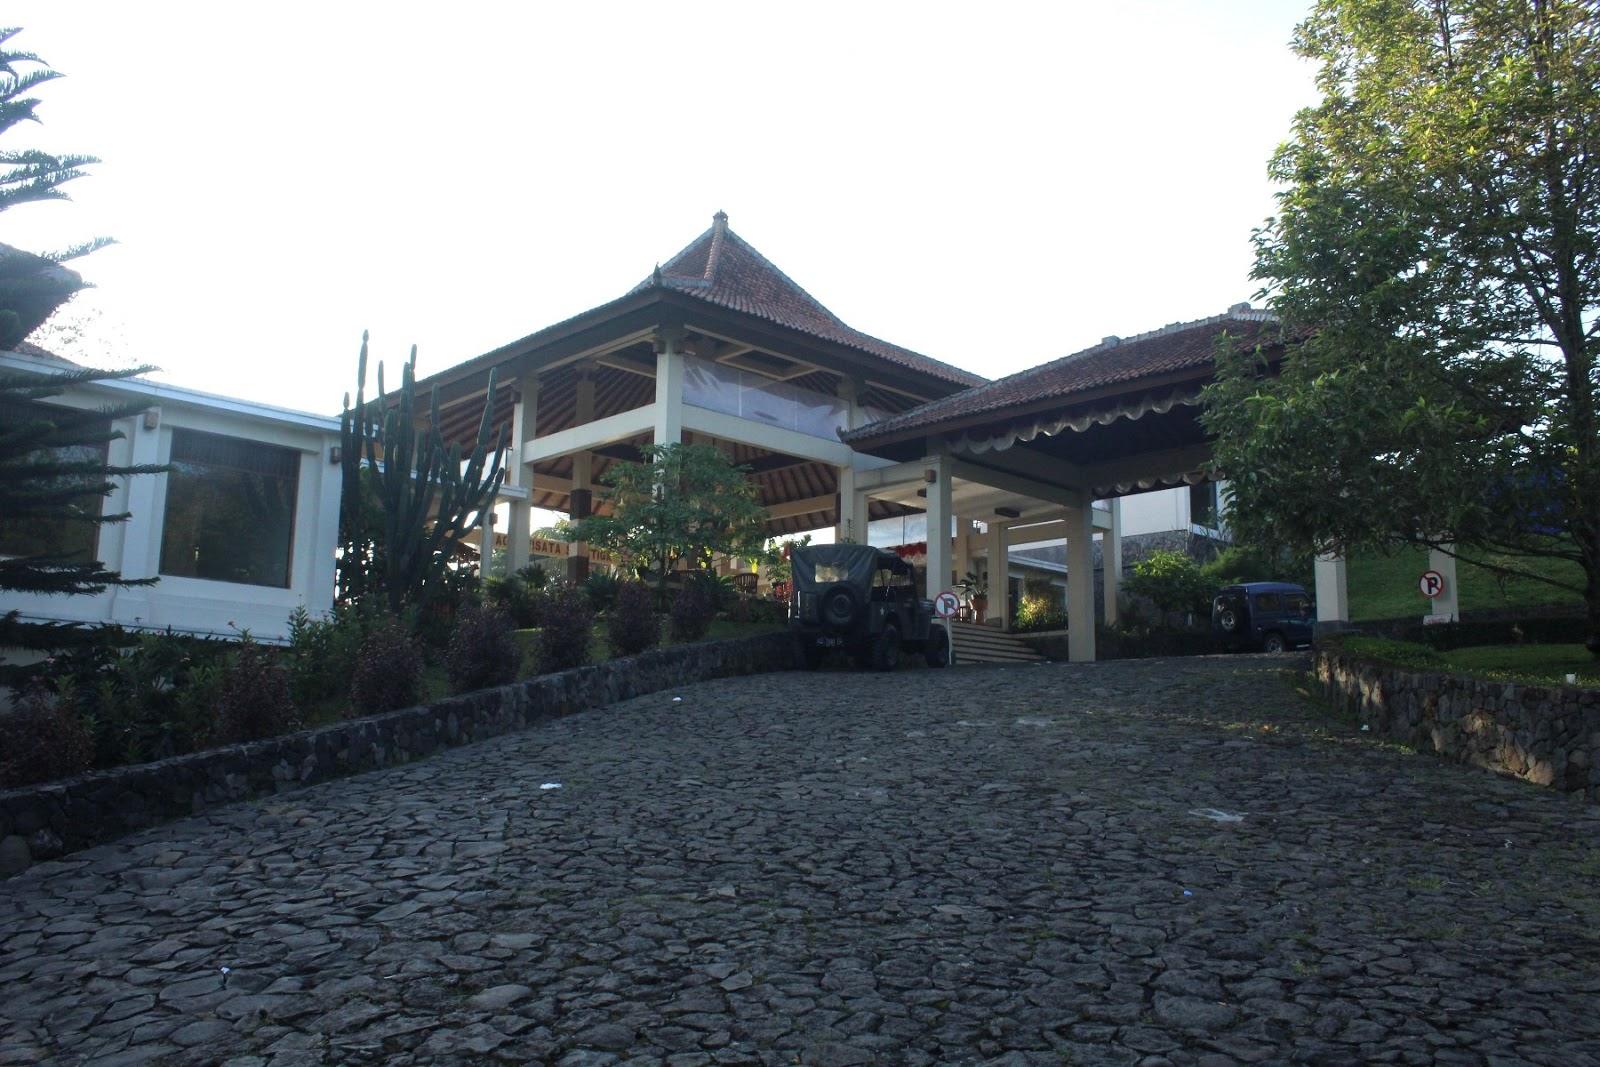 Jalan Menuju Agrowisata Hotel Salatiga